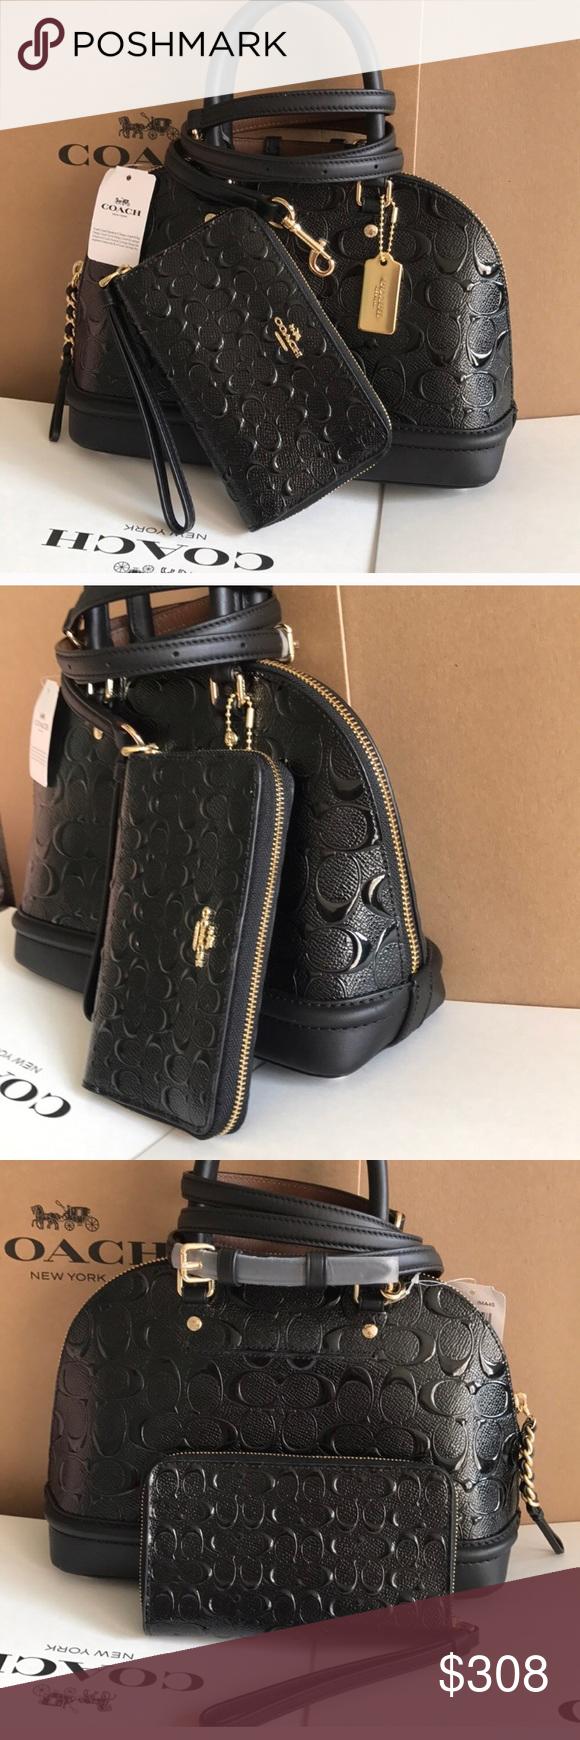 coach Sierra bag🎆Satchel/crossbody/set Wearing black